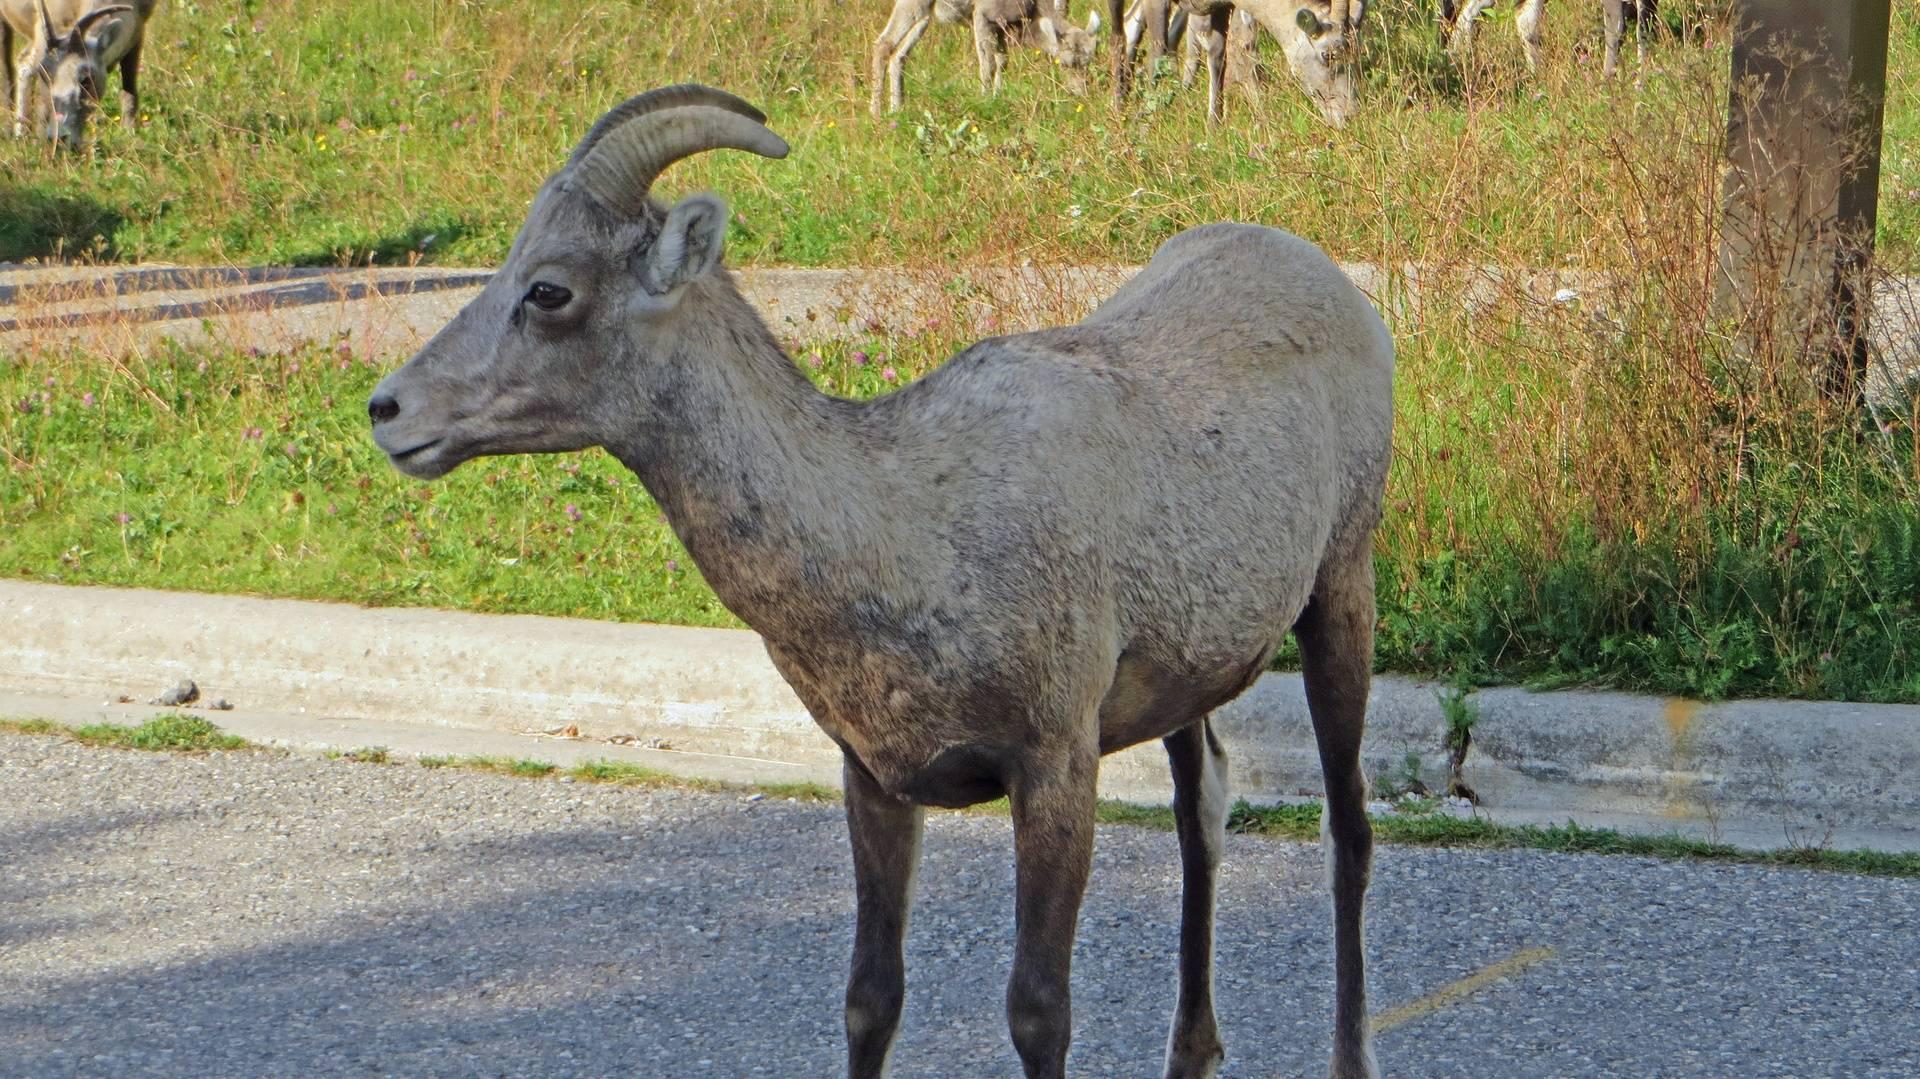 Goat at Miette Hot Springs, Jasper